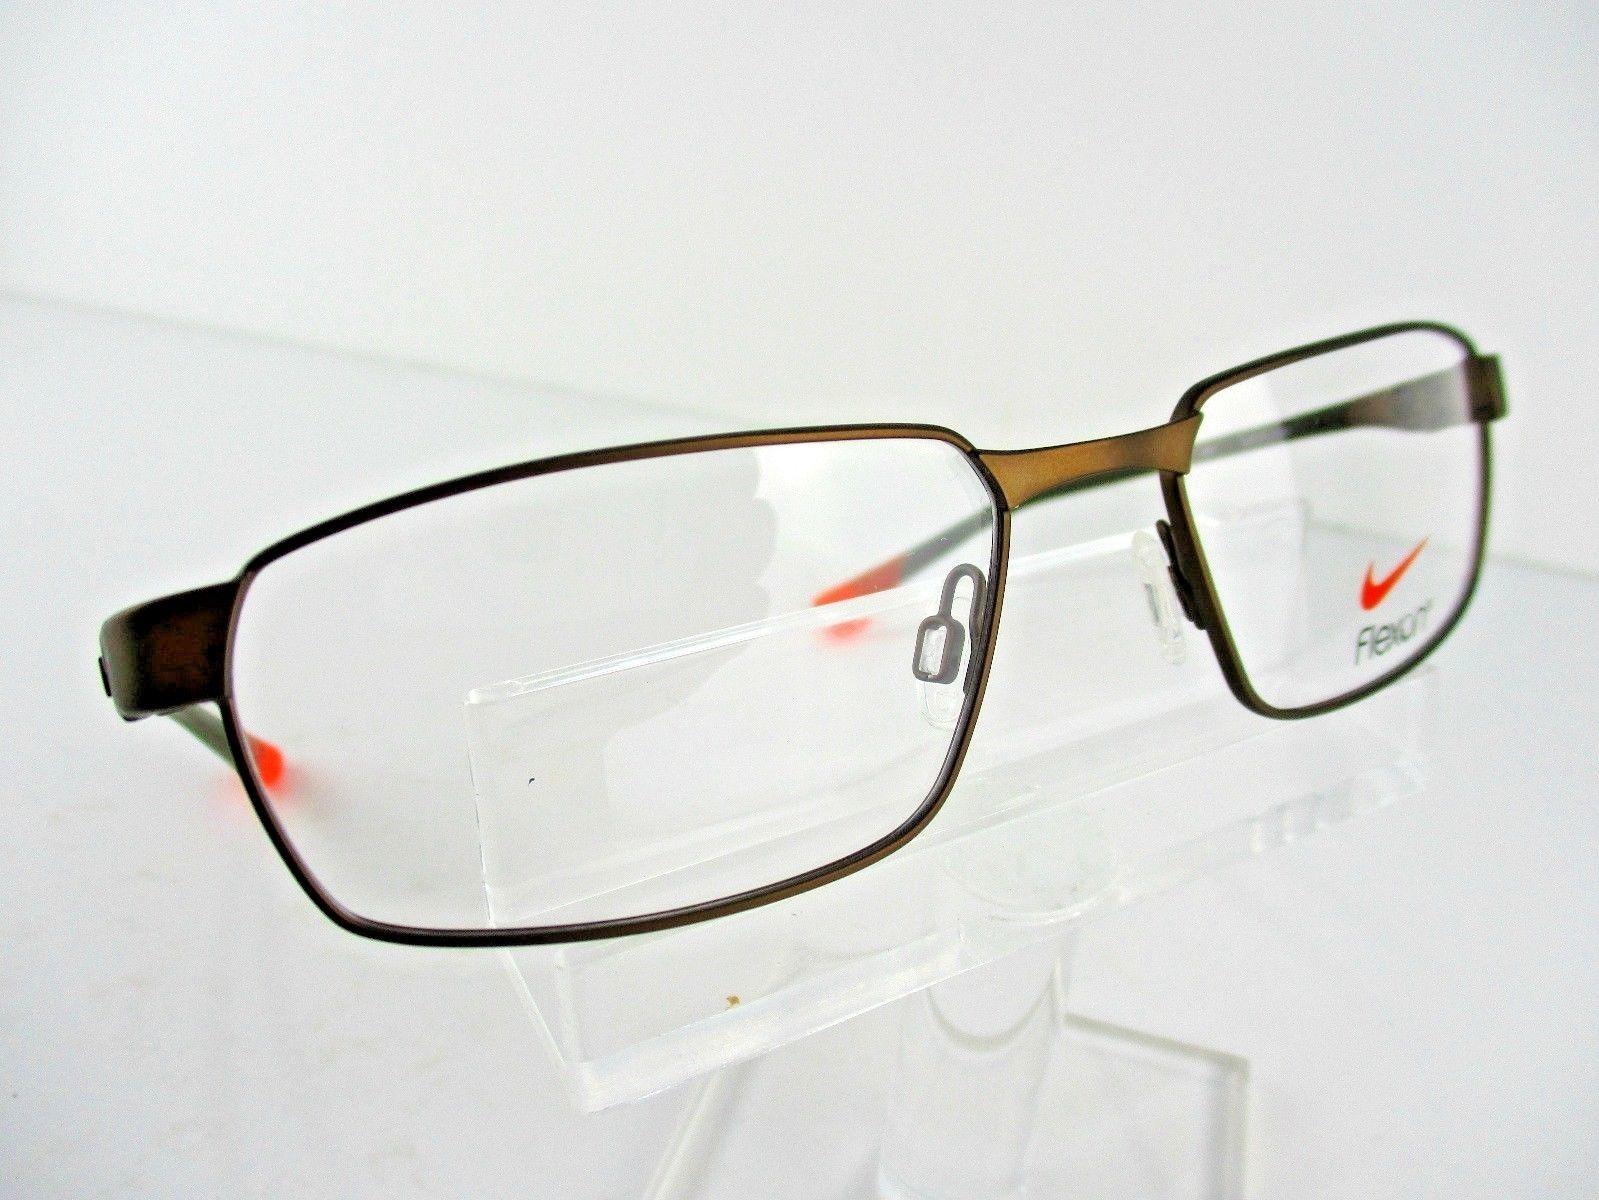 Nike Flexon Eyeglass Frame: 9 listings